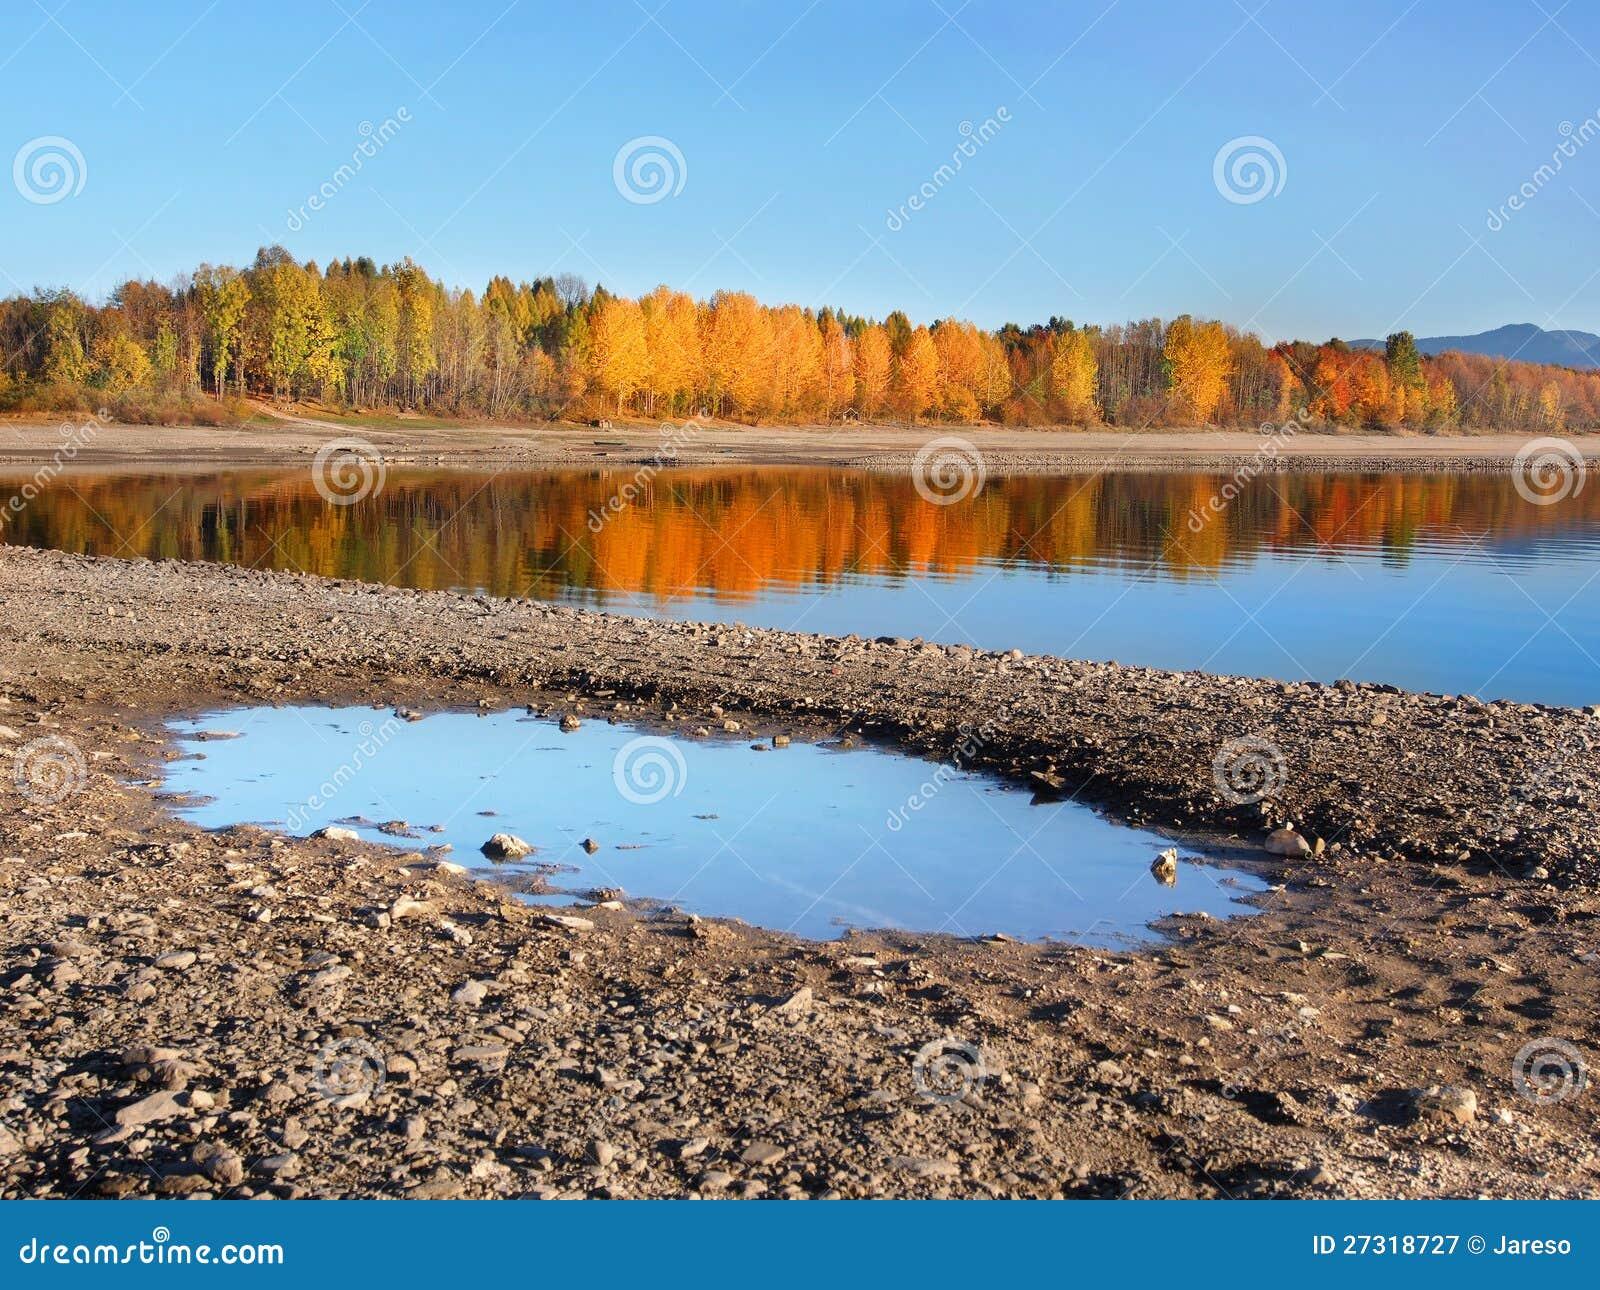 Reflection of trees in Liptovska Mara at autumn